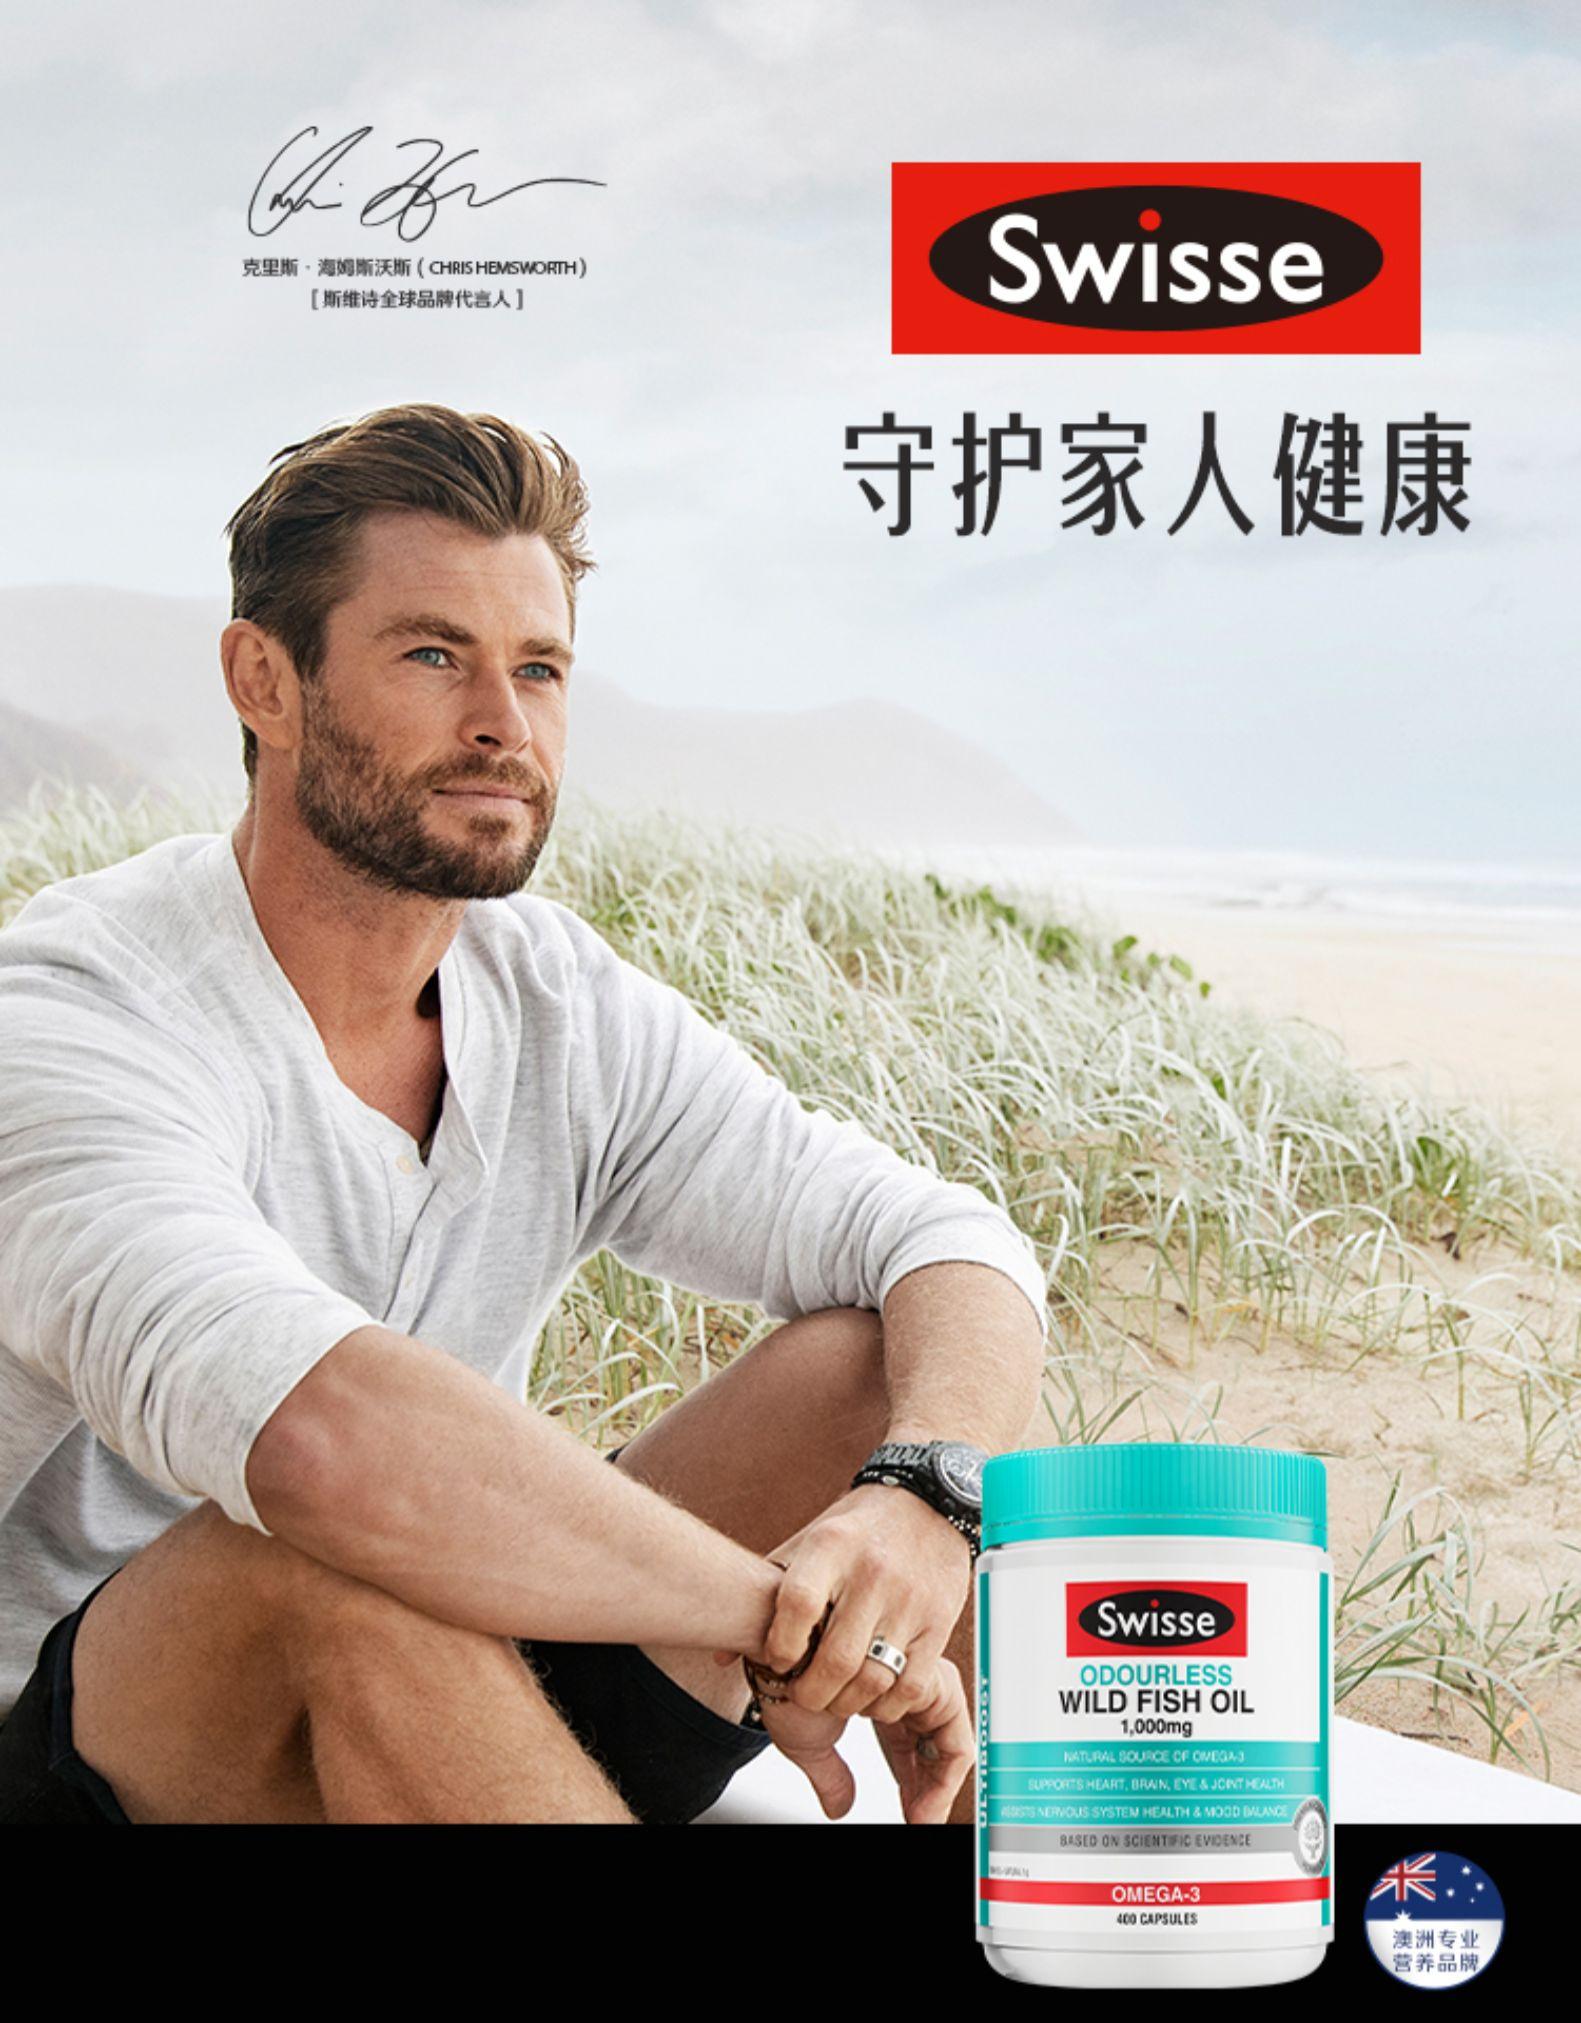 Swisse 无腥味深海鱼油软胶囊 1000mg*400粒 图1